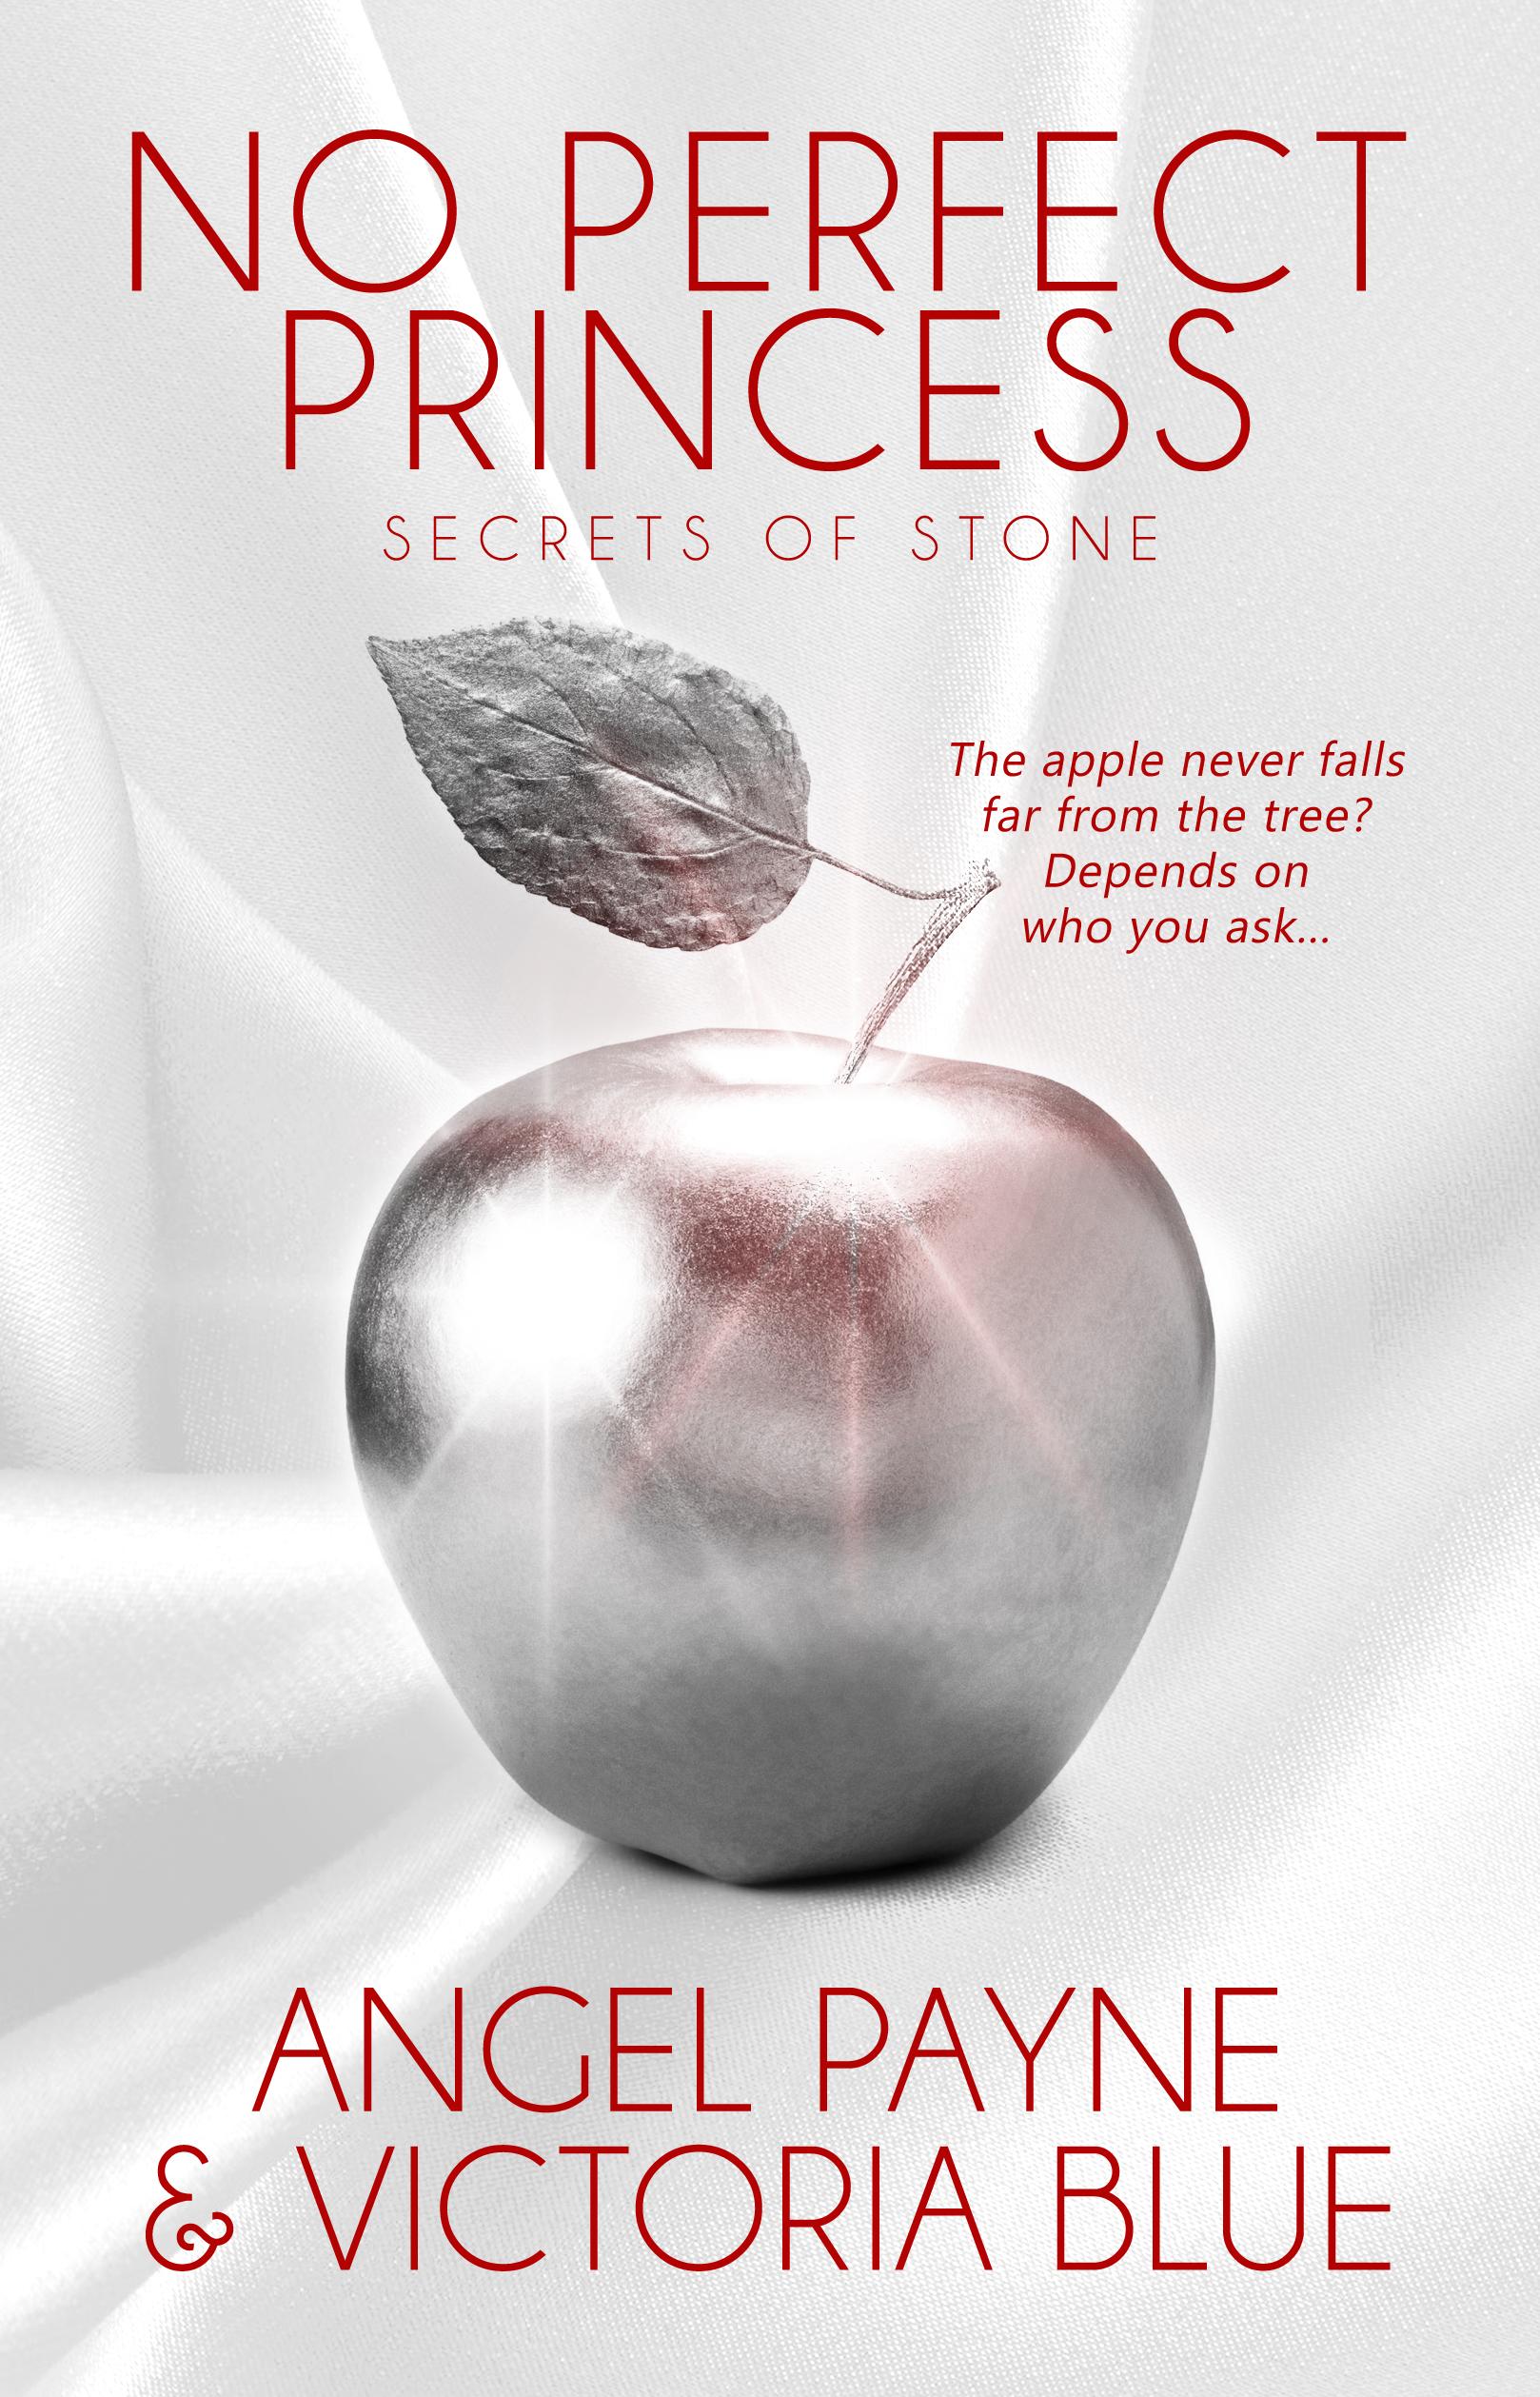 Angel Payne - Secrets of Stone 3 - No Perfect Princess